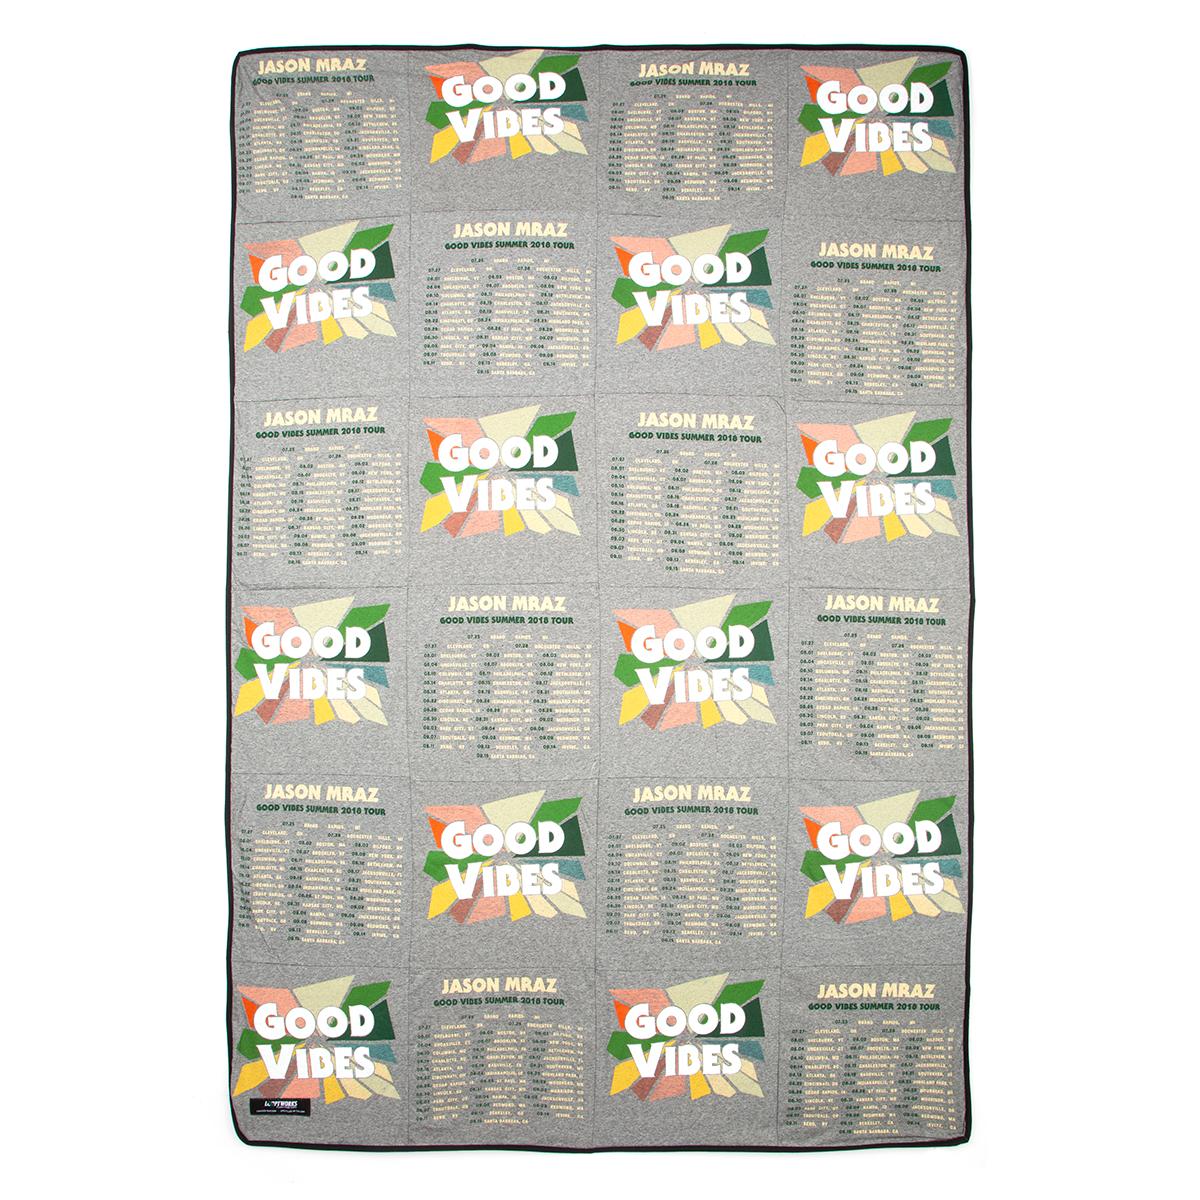 Jason Mraz Good Vibes 2018 Tour Dates Recycled Blanket